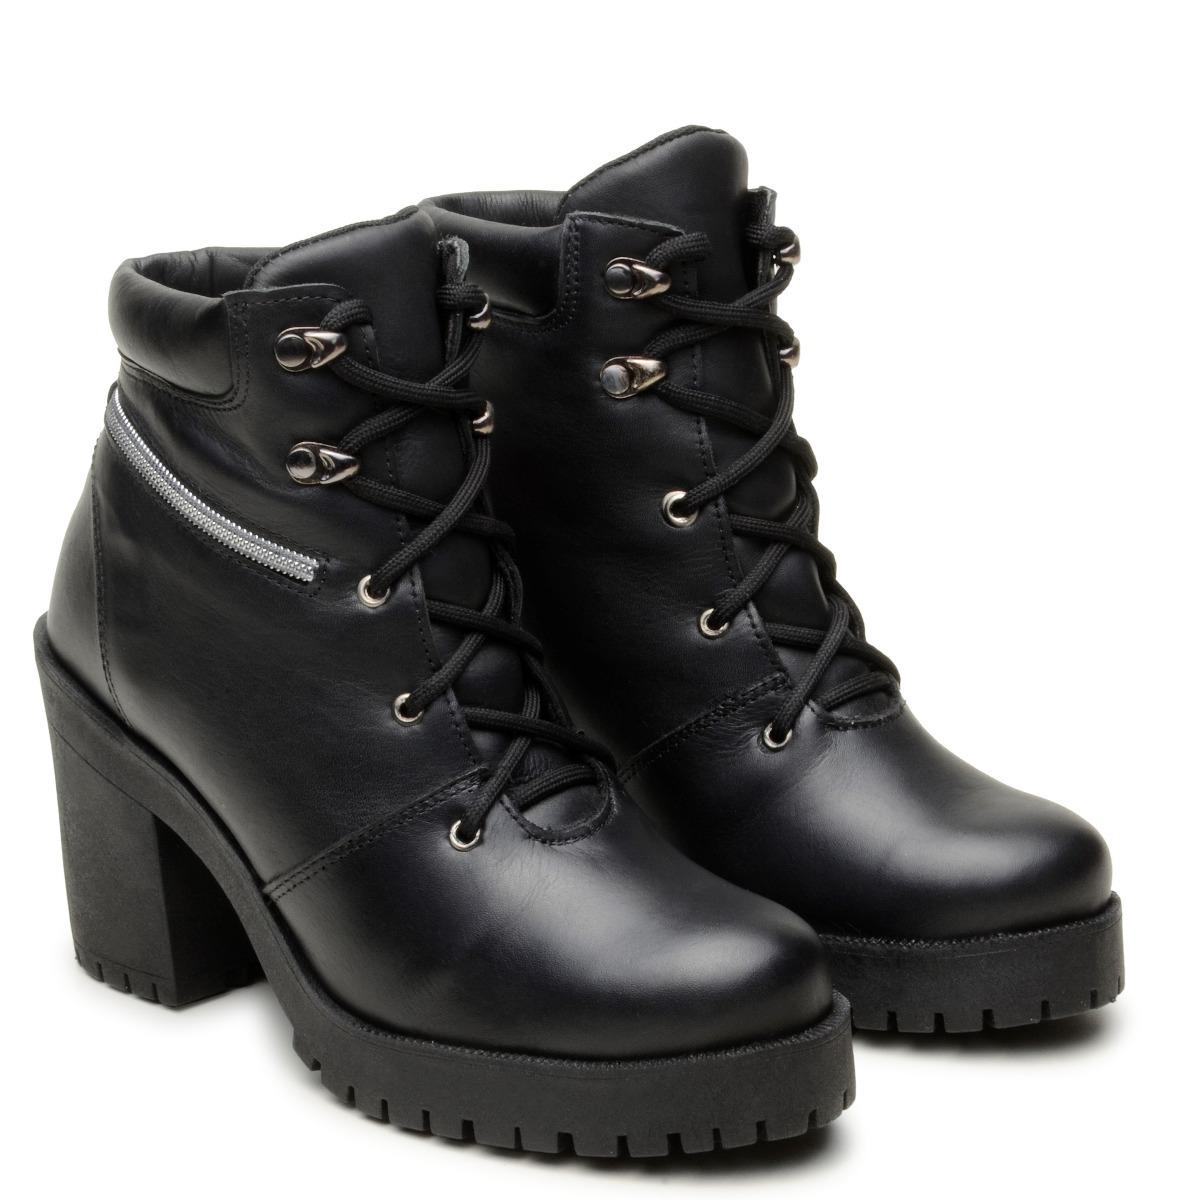 4131c7e973 bota coturno feminino 100% couro confort salto alto preto. Carregando zoom.